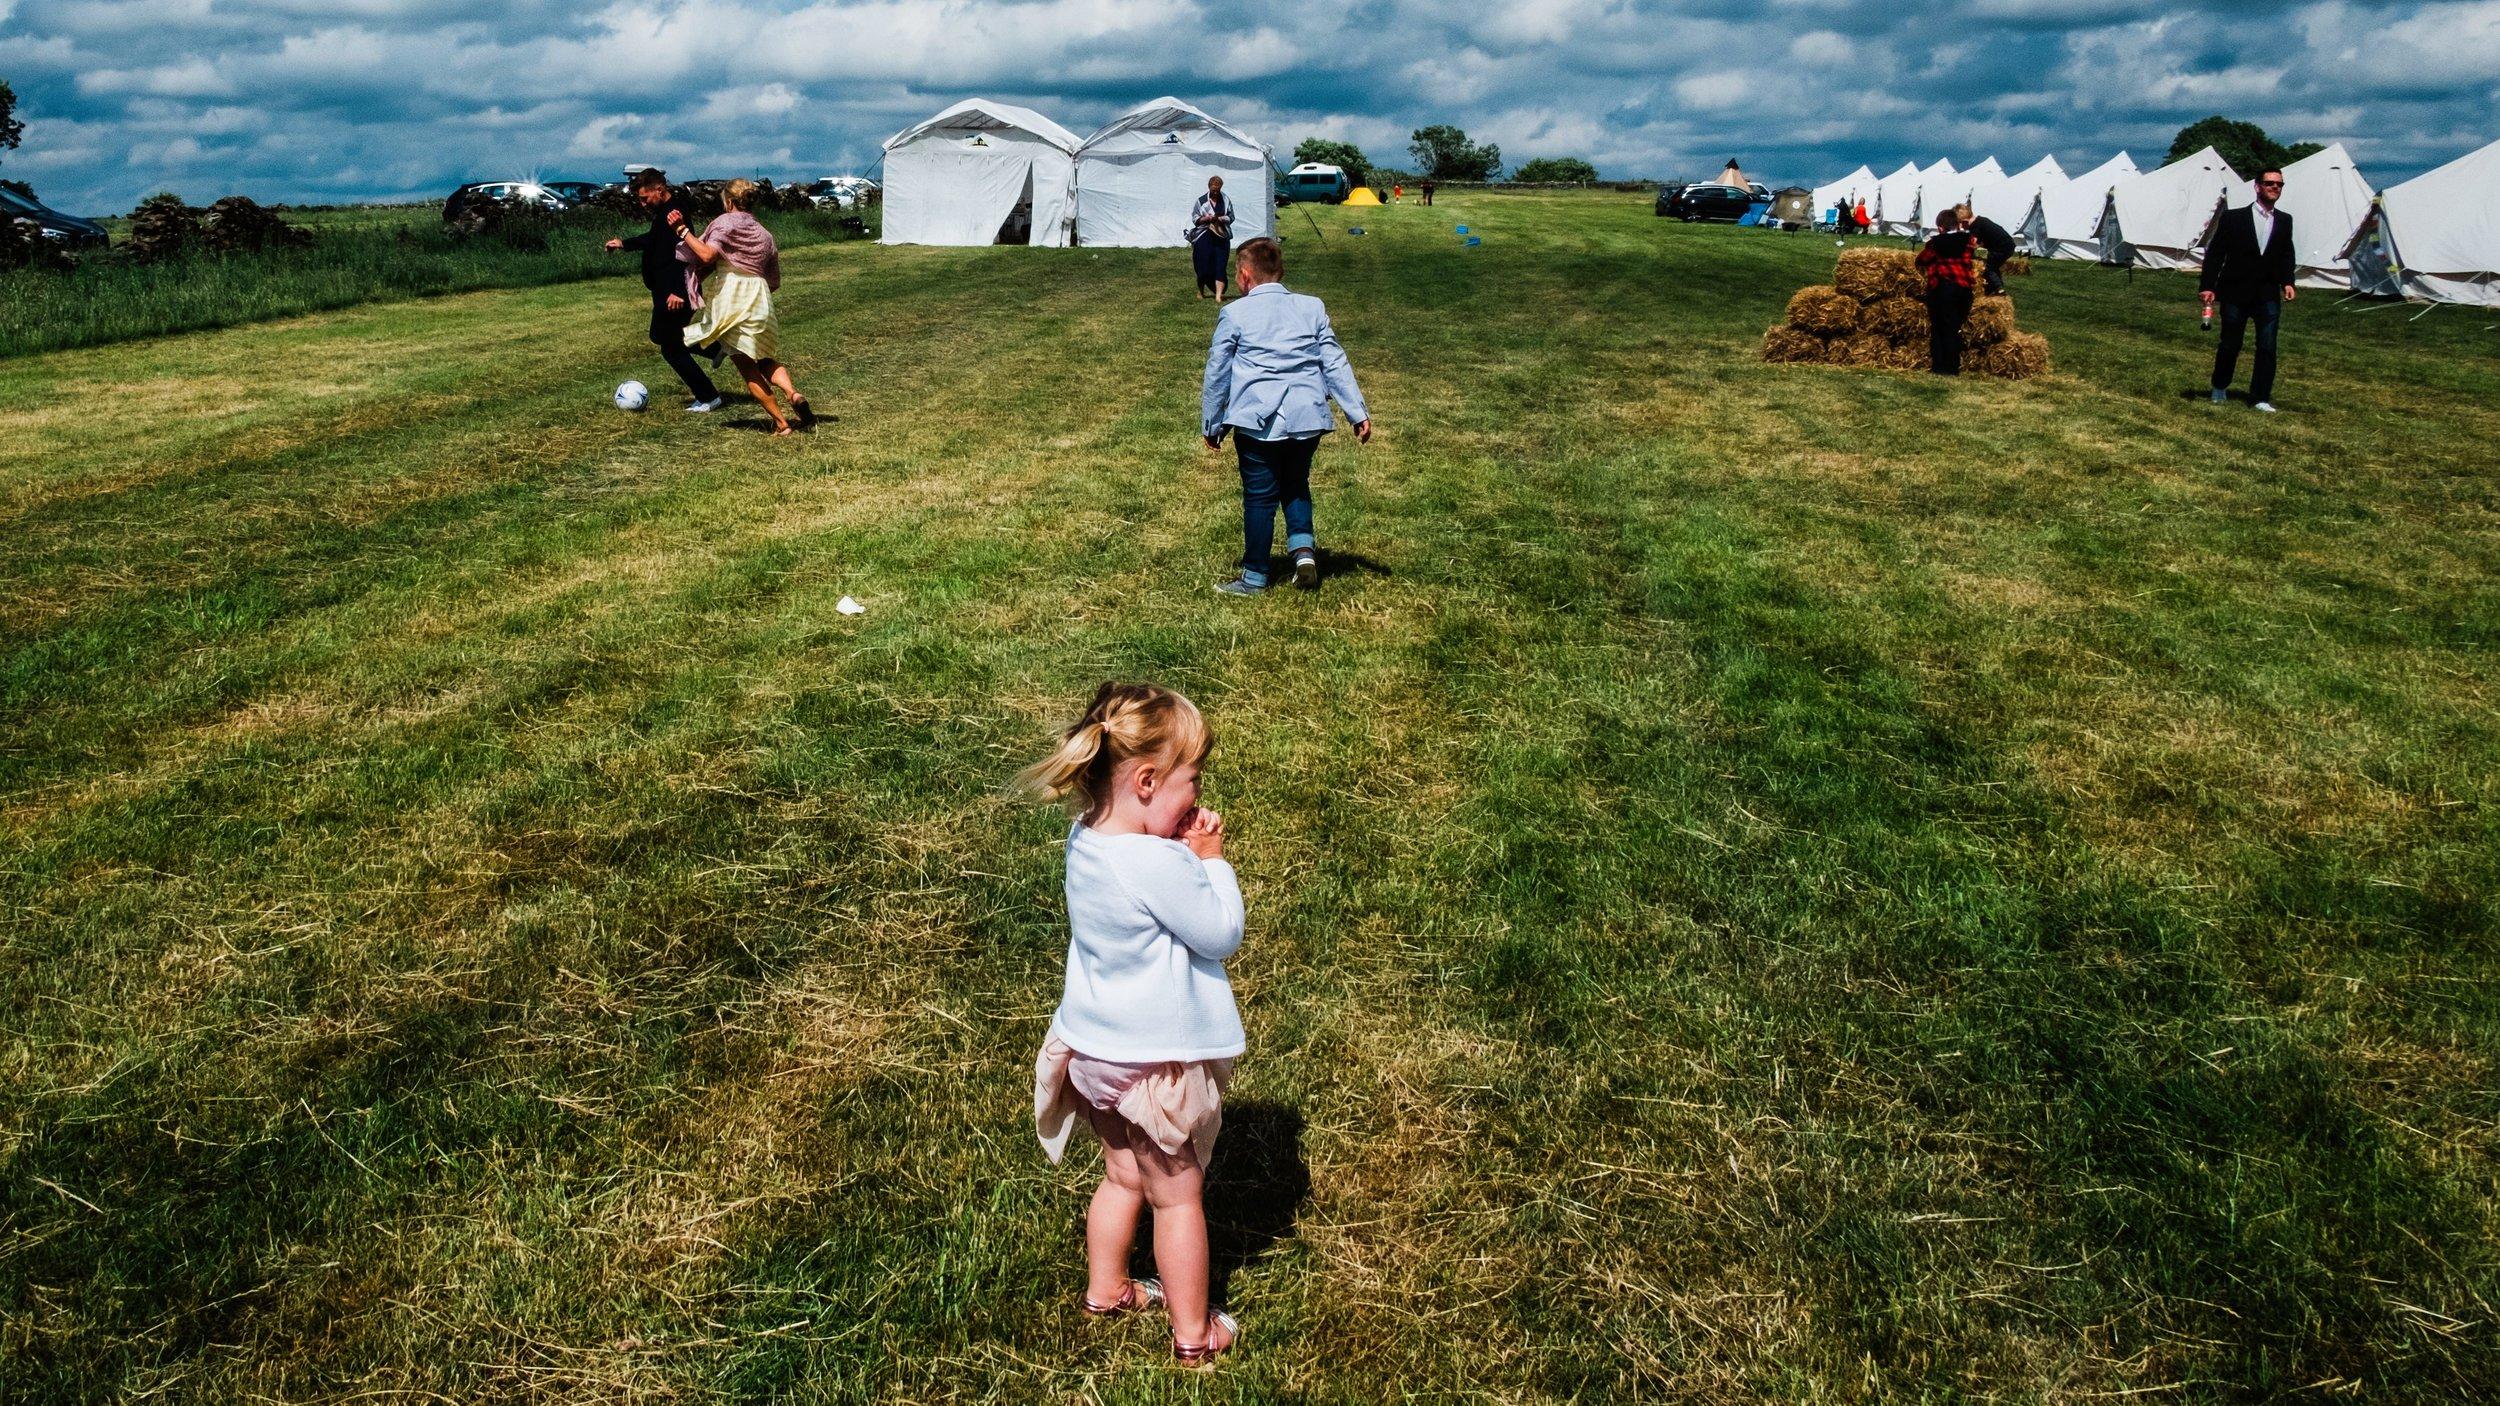 Teepee_Festival_Wedding_Peak_District_Derbyshire_colour_437.JPG